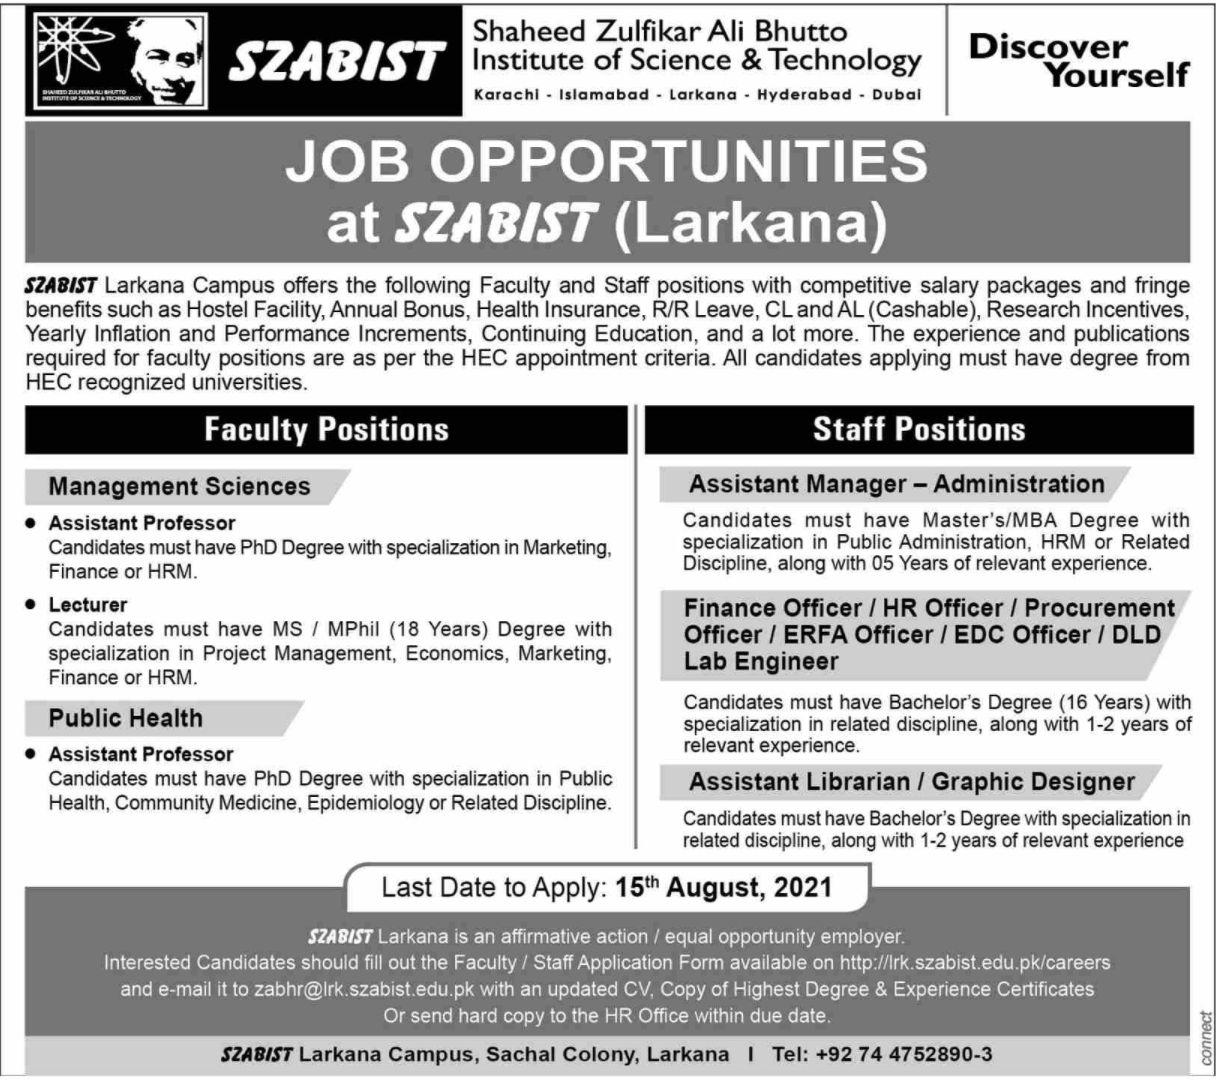 Shaheed Zulfikar Ali Bhutto Institute of Science & Technology Vacancies 2021 1